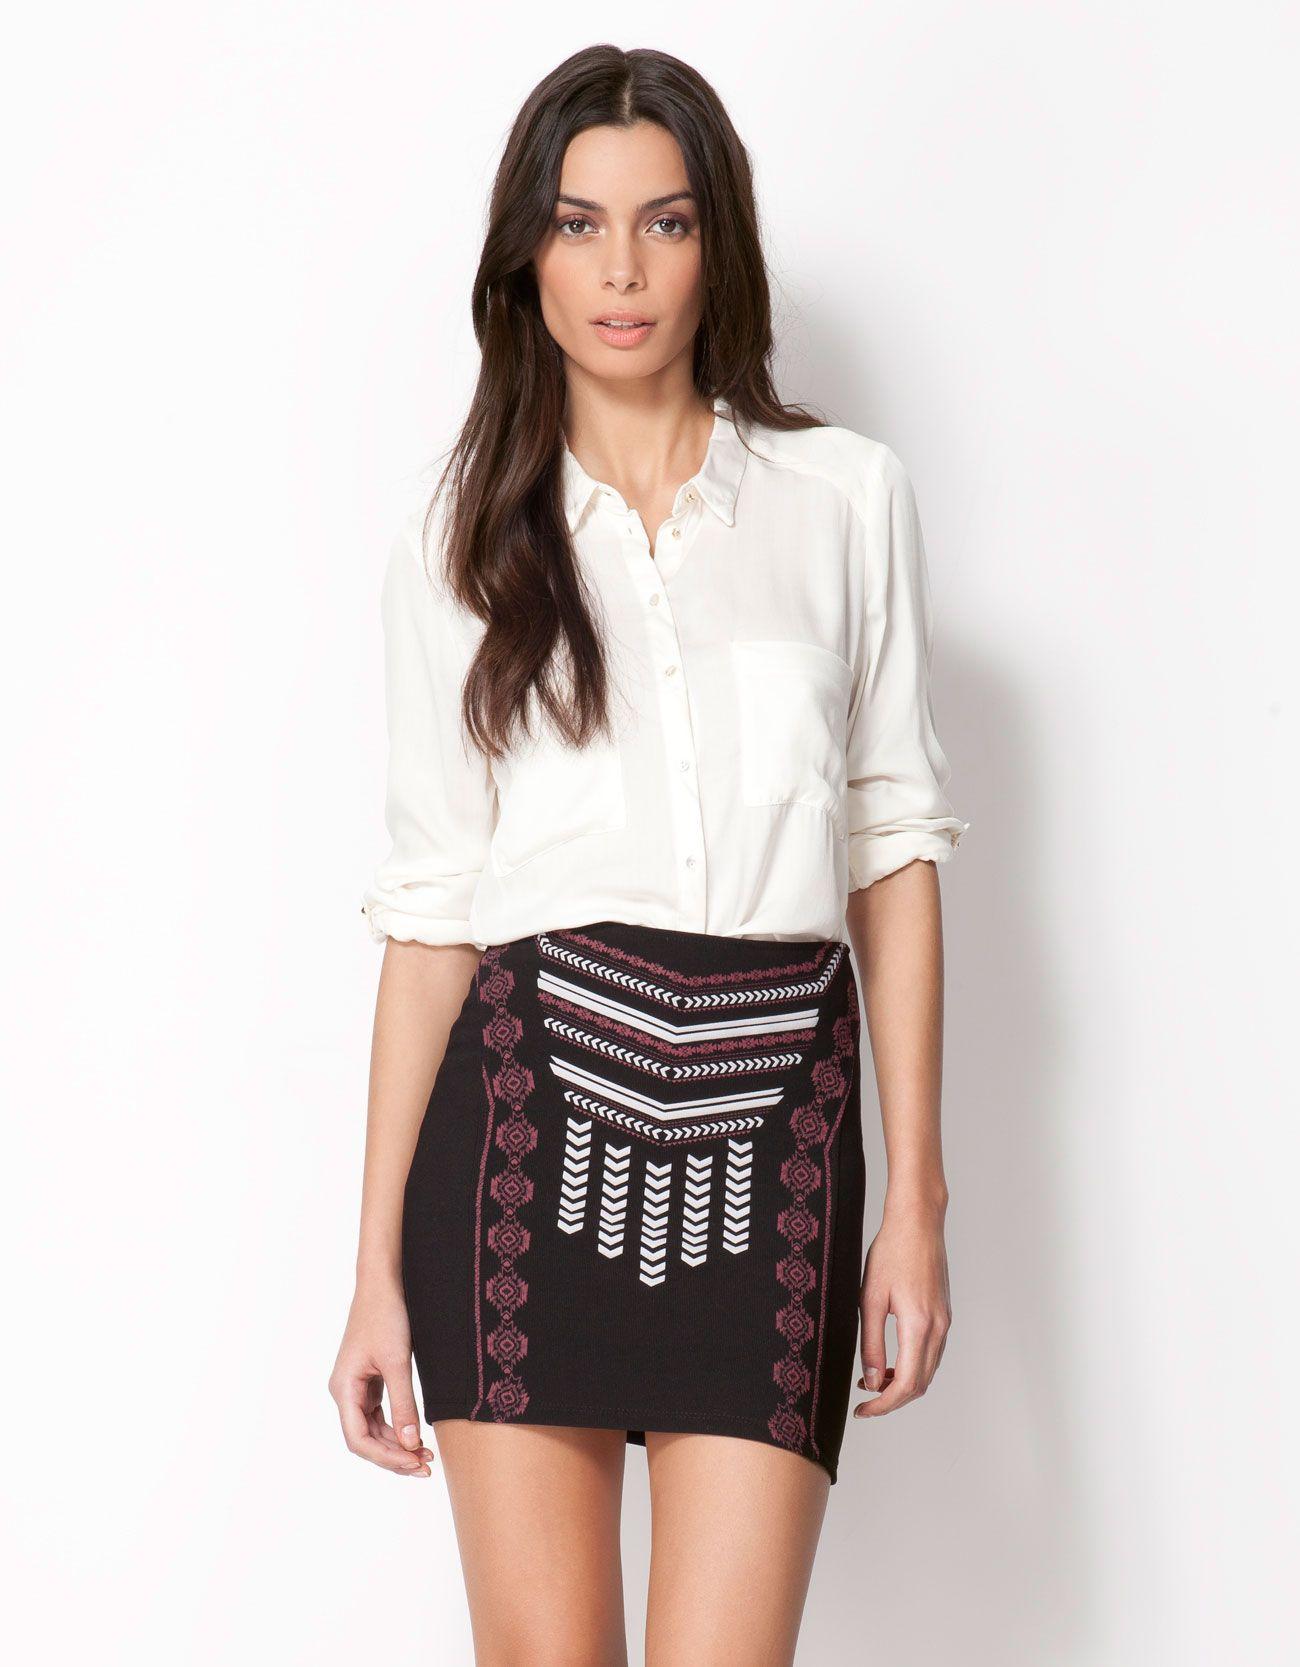 b90b35948 Bershka Lebanon - Bershka coloured shirt | Clothes & Shoes | Fashion ...